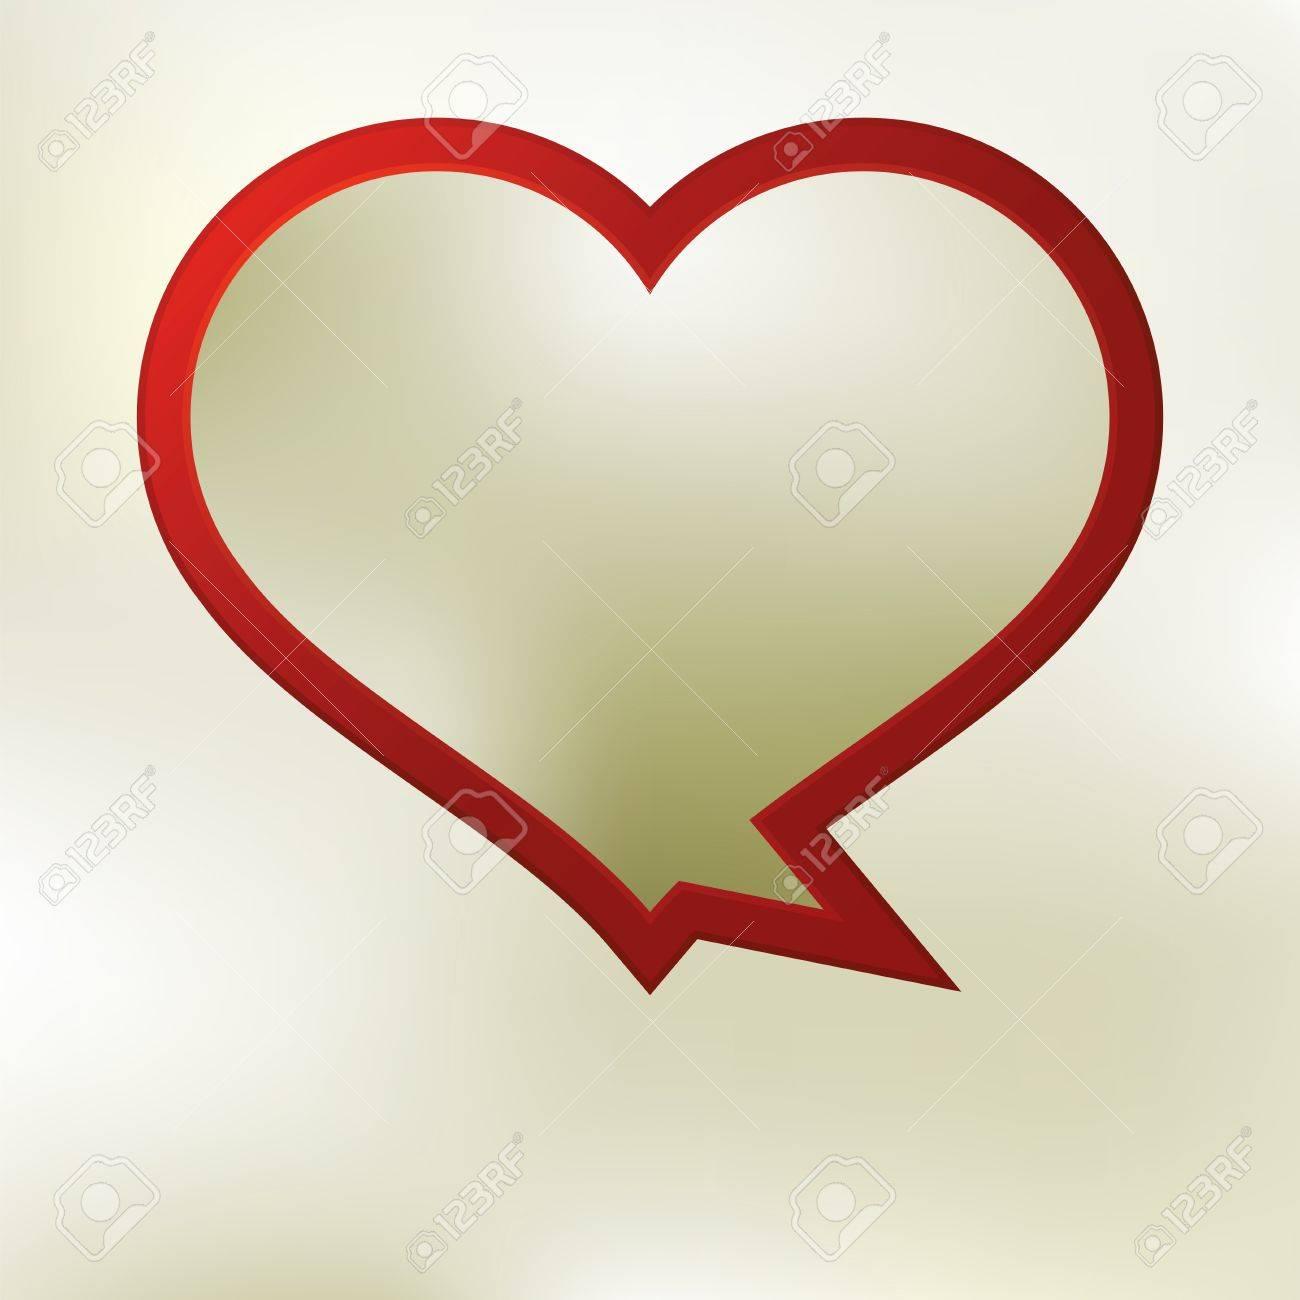 Heart speech bubble template    EPS8 Stock Vector - 17524329